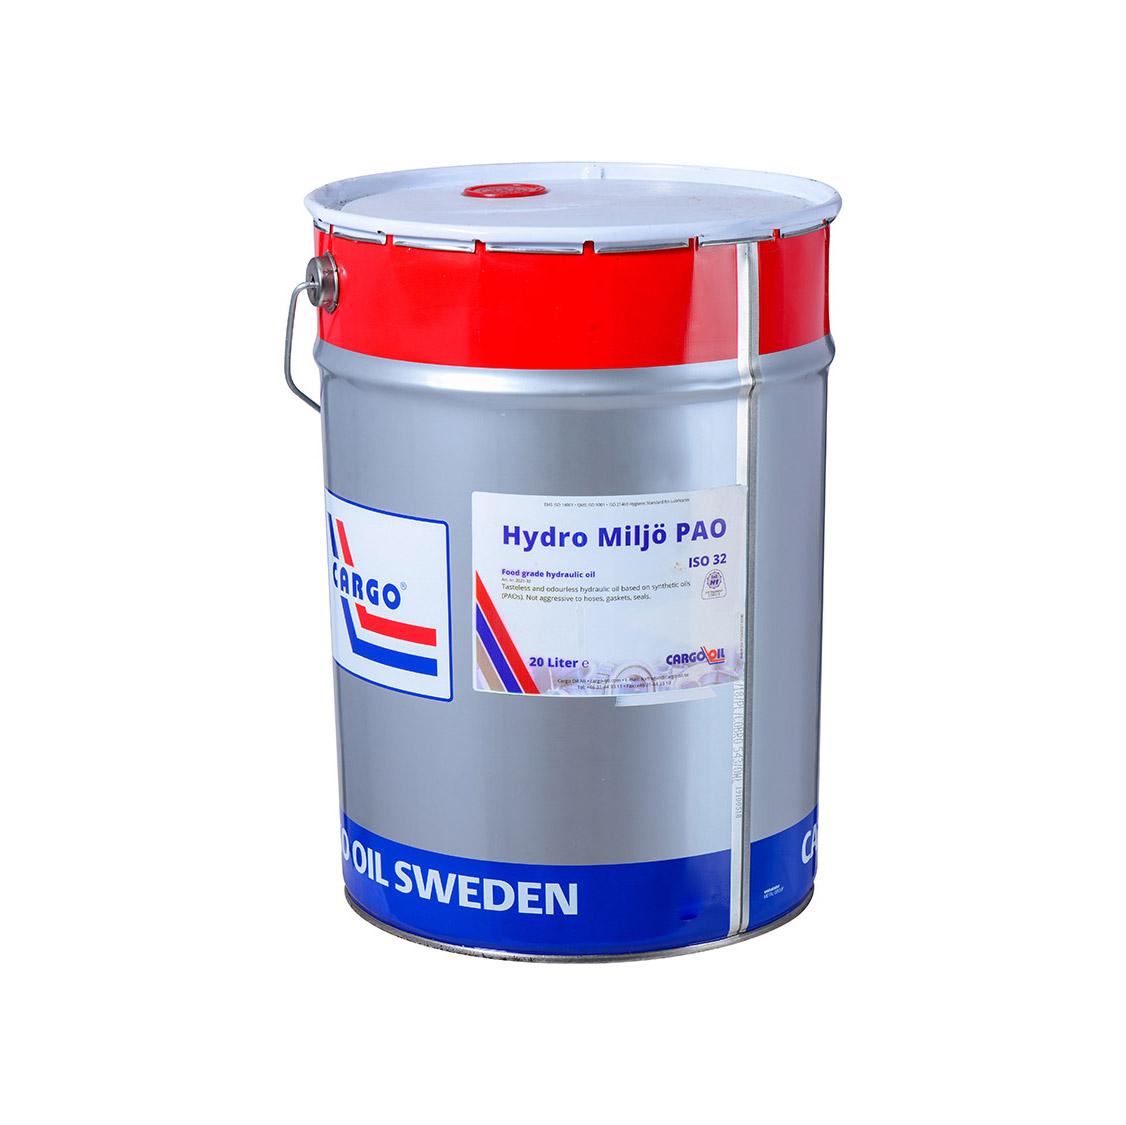 Hydro Miljo PAO 食品级合成液压油